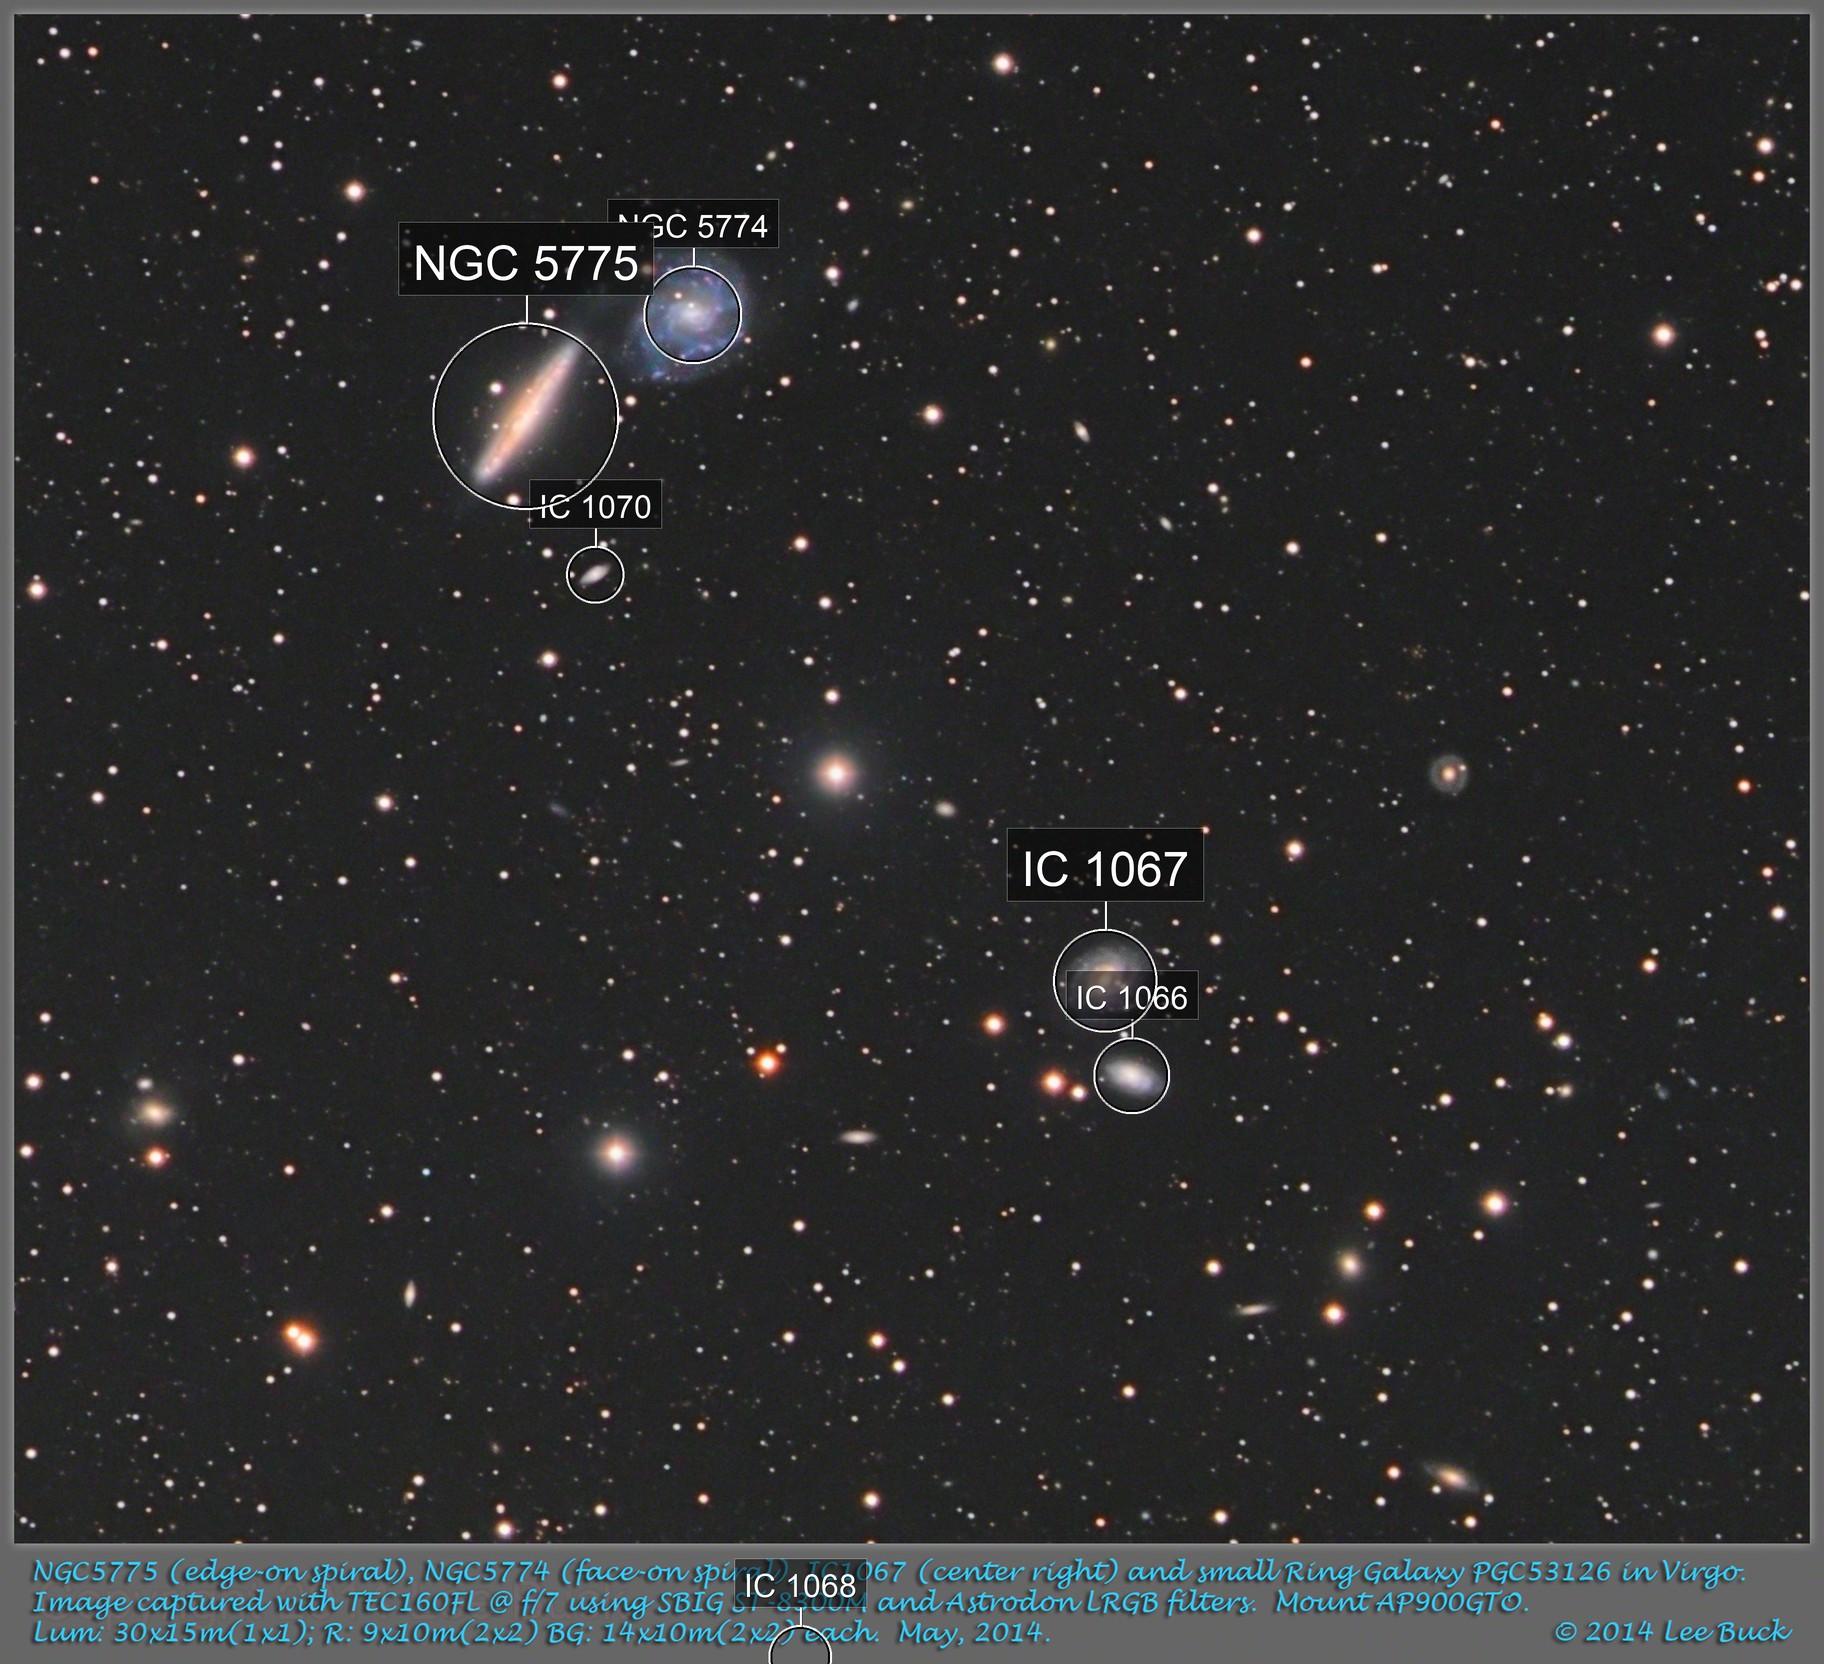 NGC5774, NGC5775 in Virgo